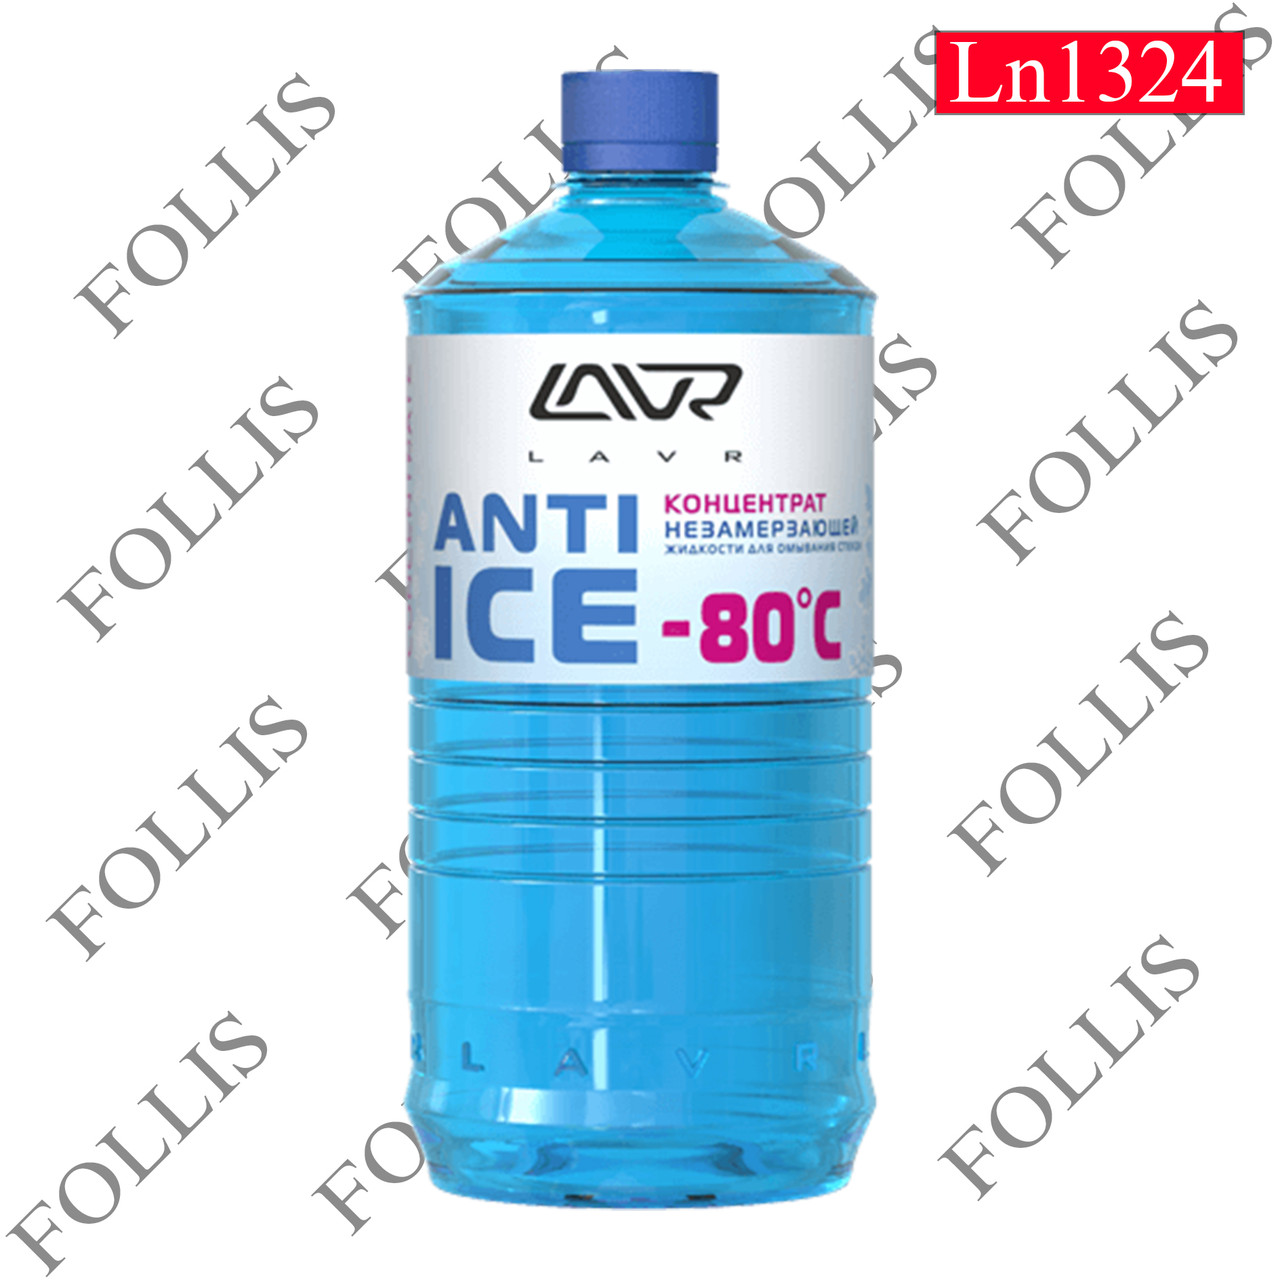 Концентрат незамерзающей жидкости для омывания стекол Anti-ice (-80C) LAVR Anti- ice concentrate 100